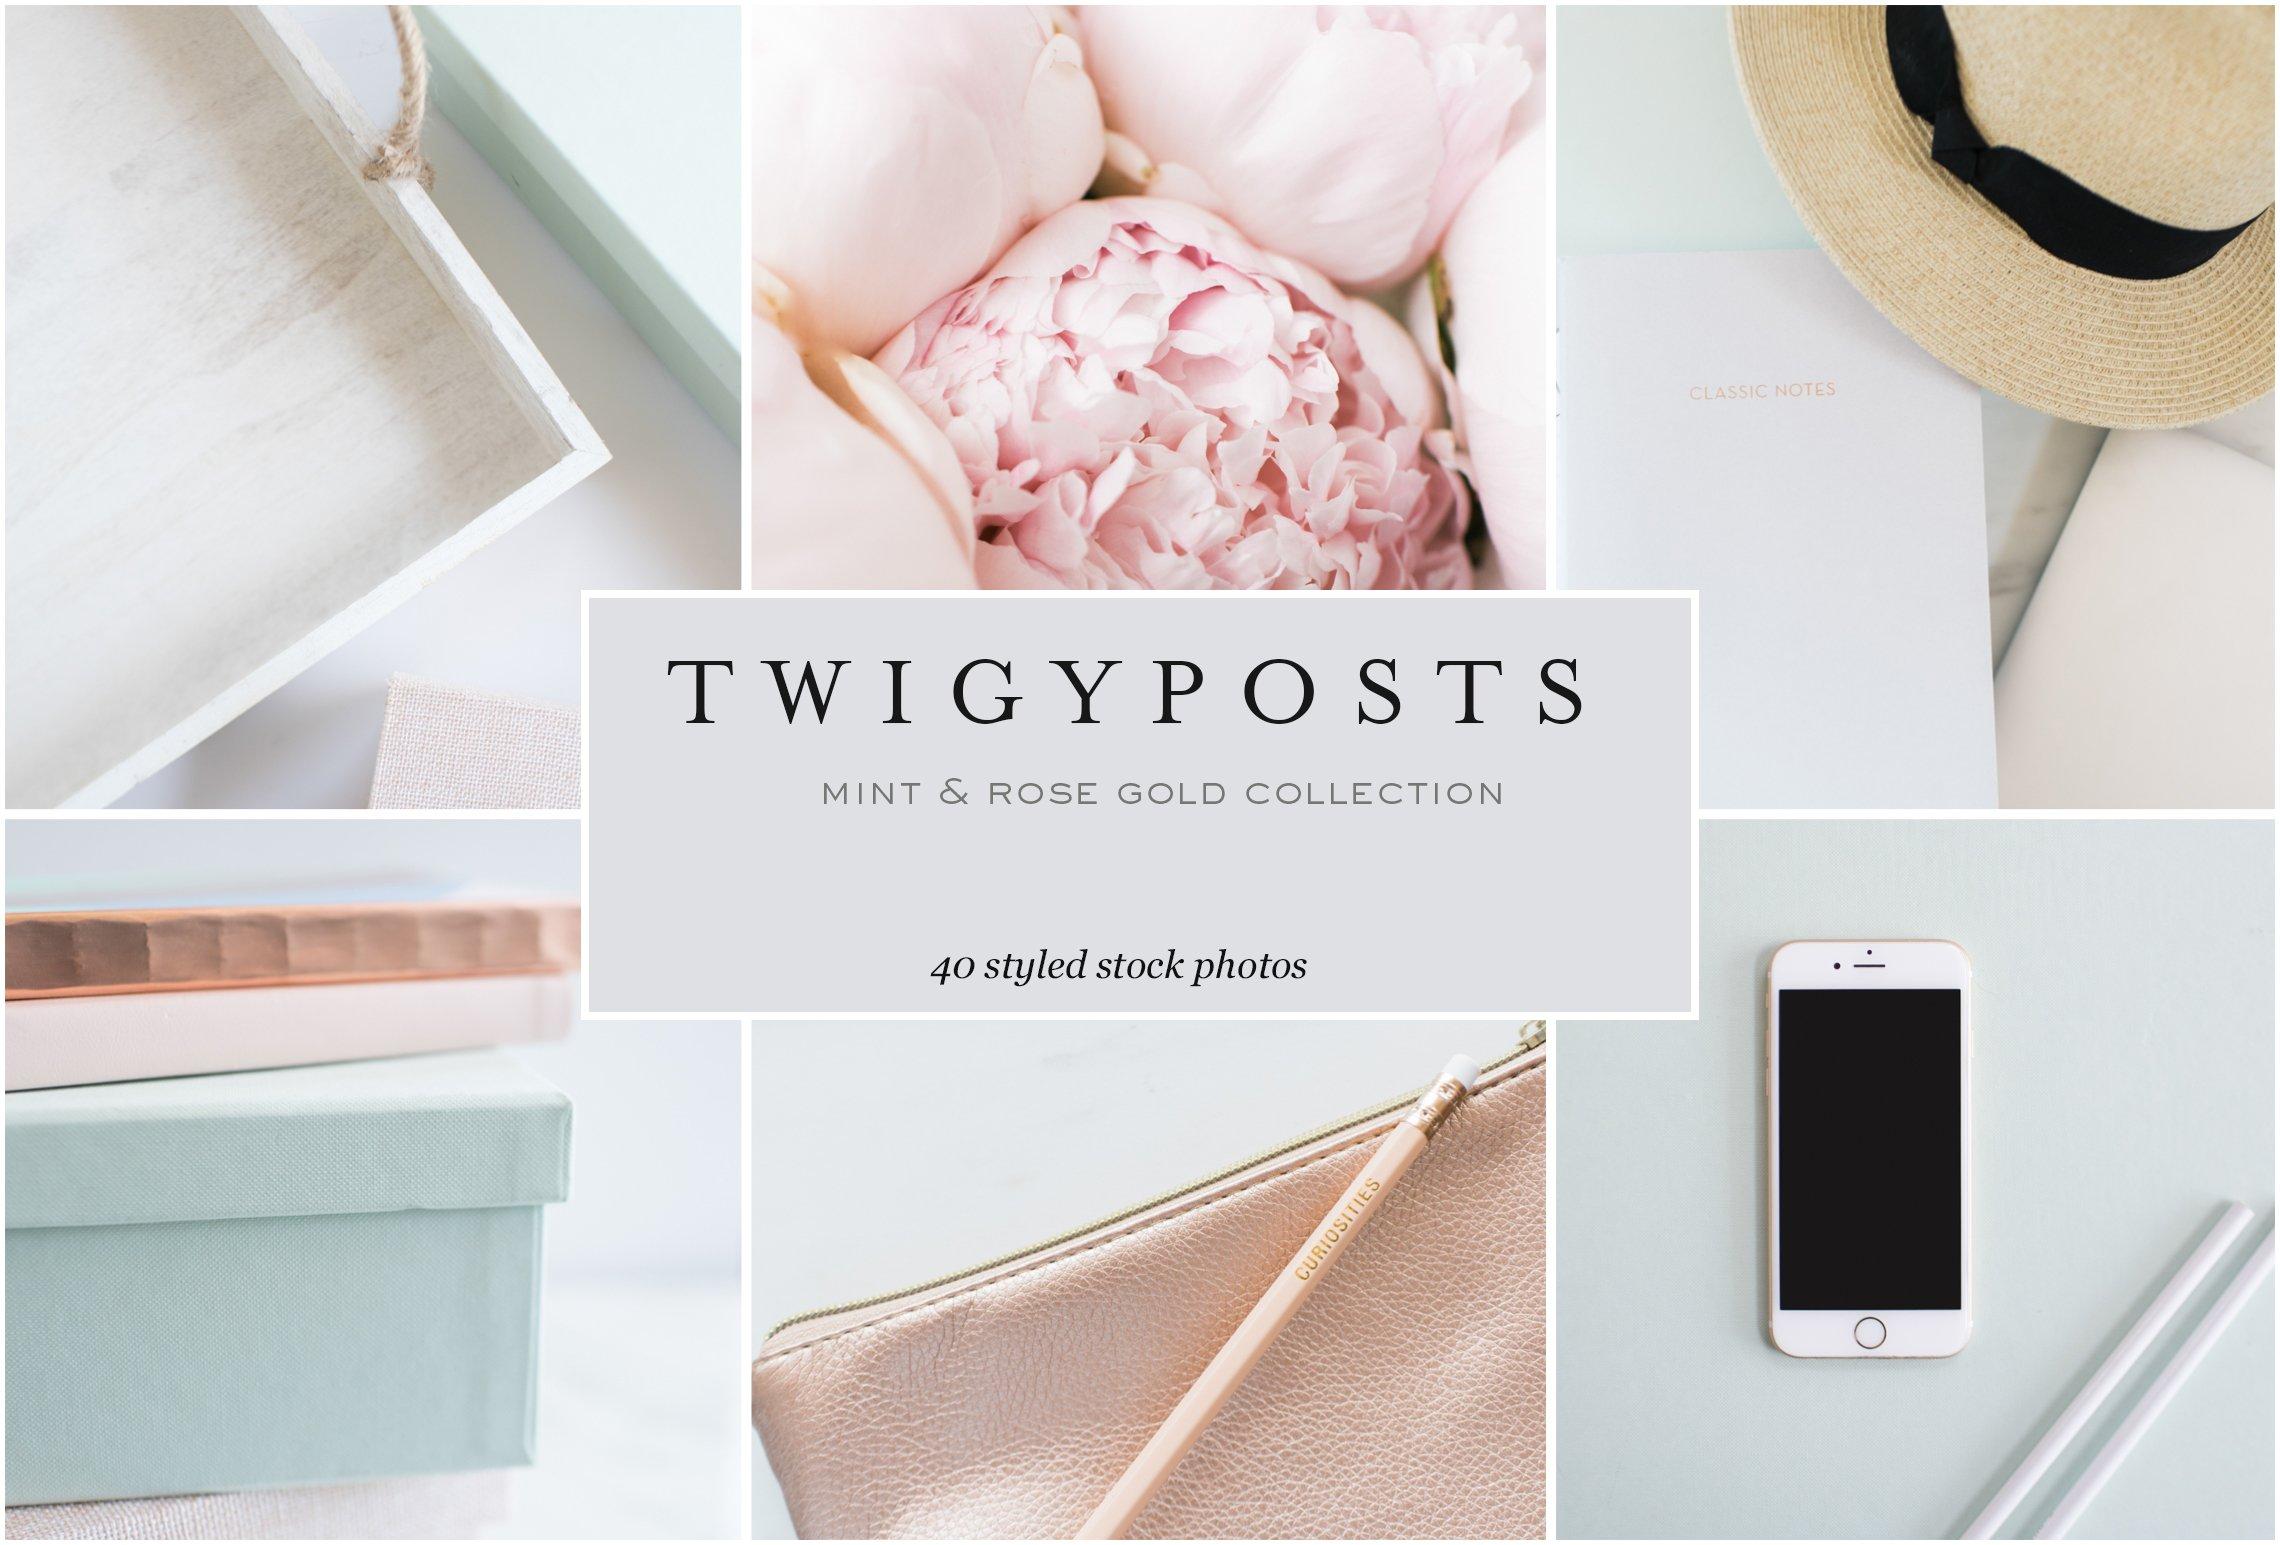 Mint Rose Gold Stock Photos Instagram Templates Creative Market